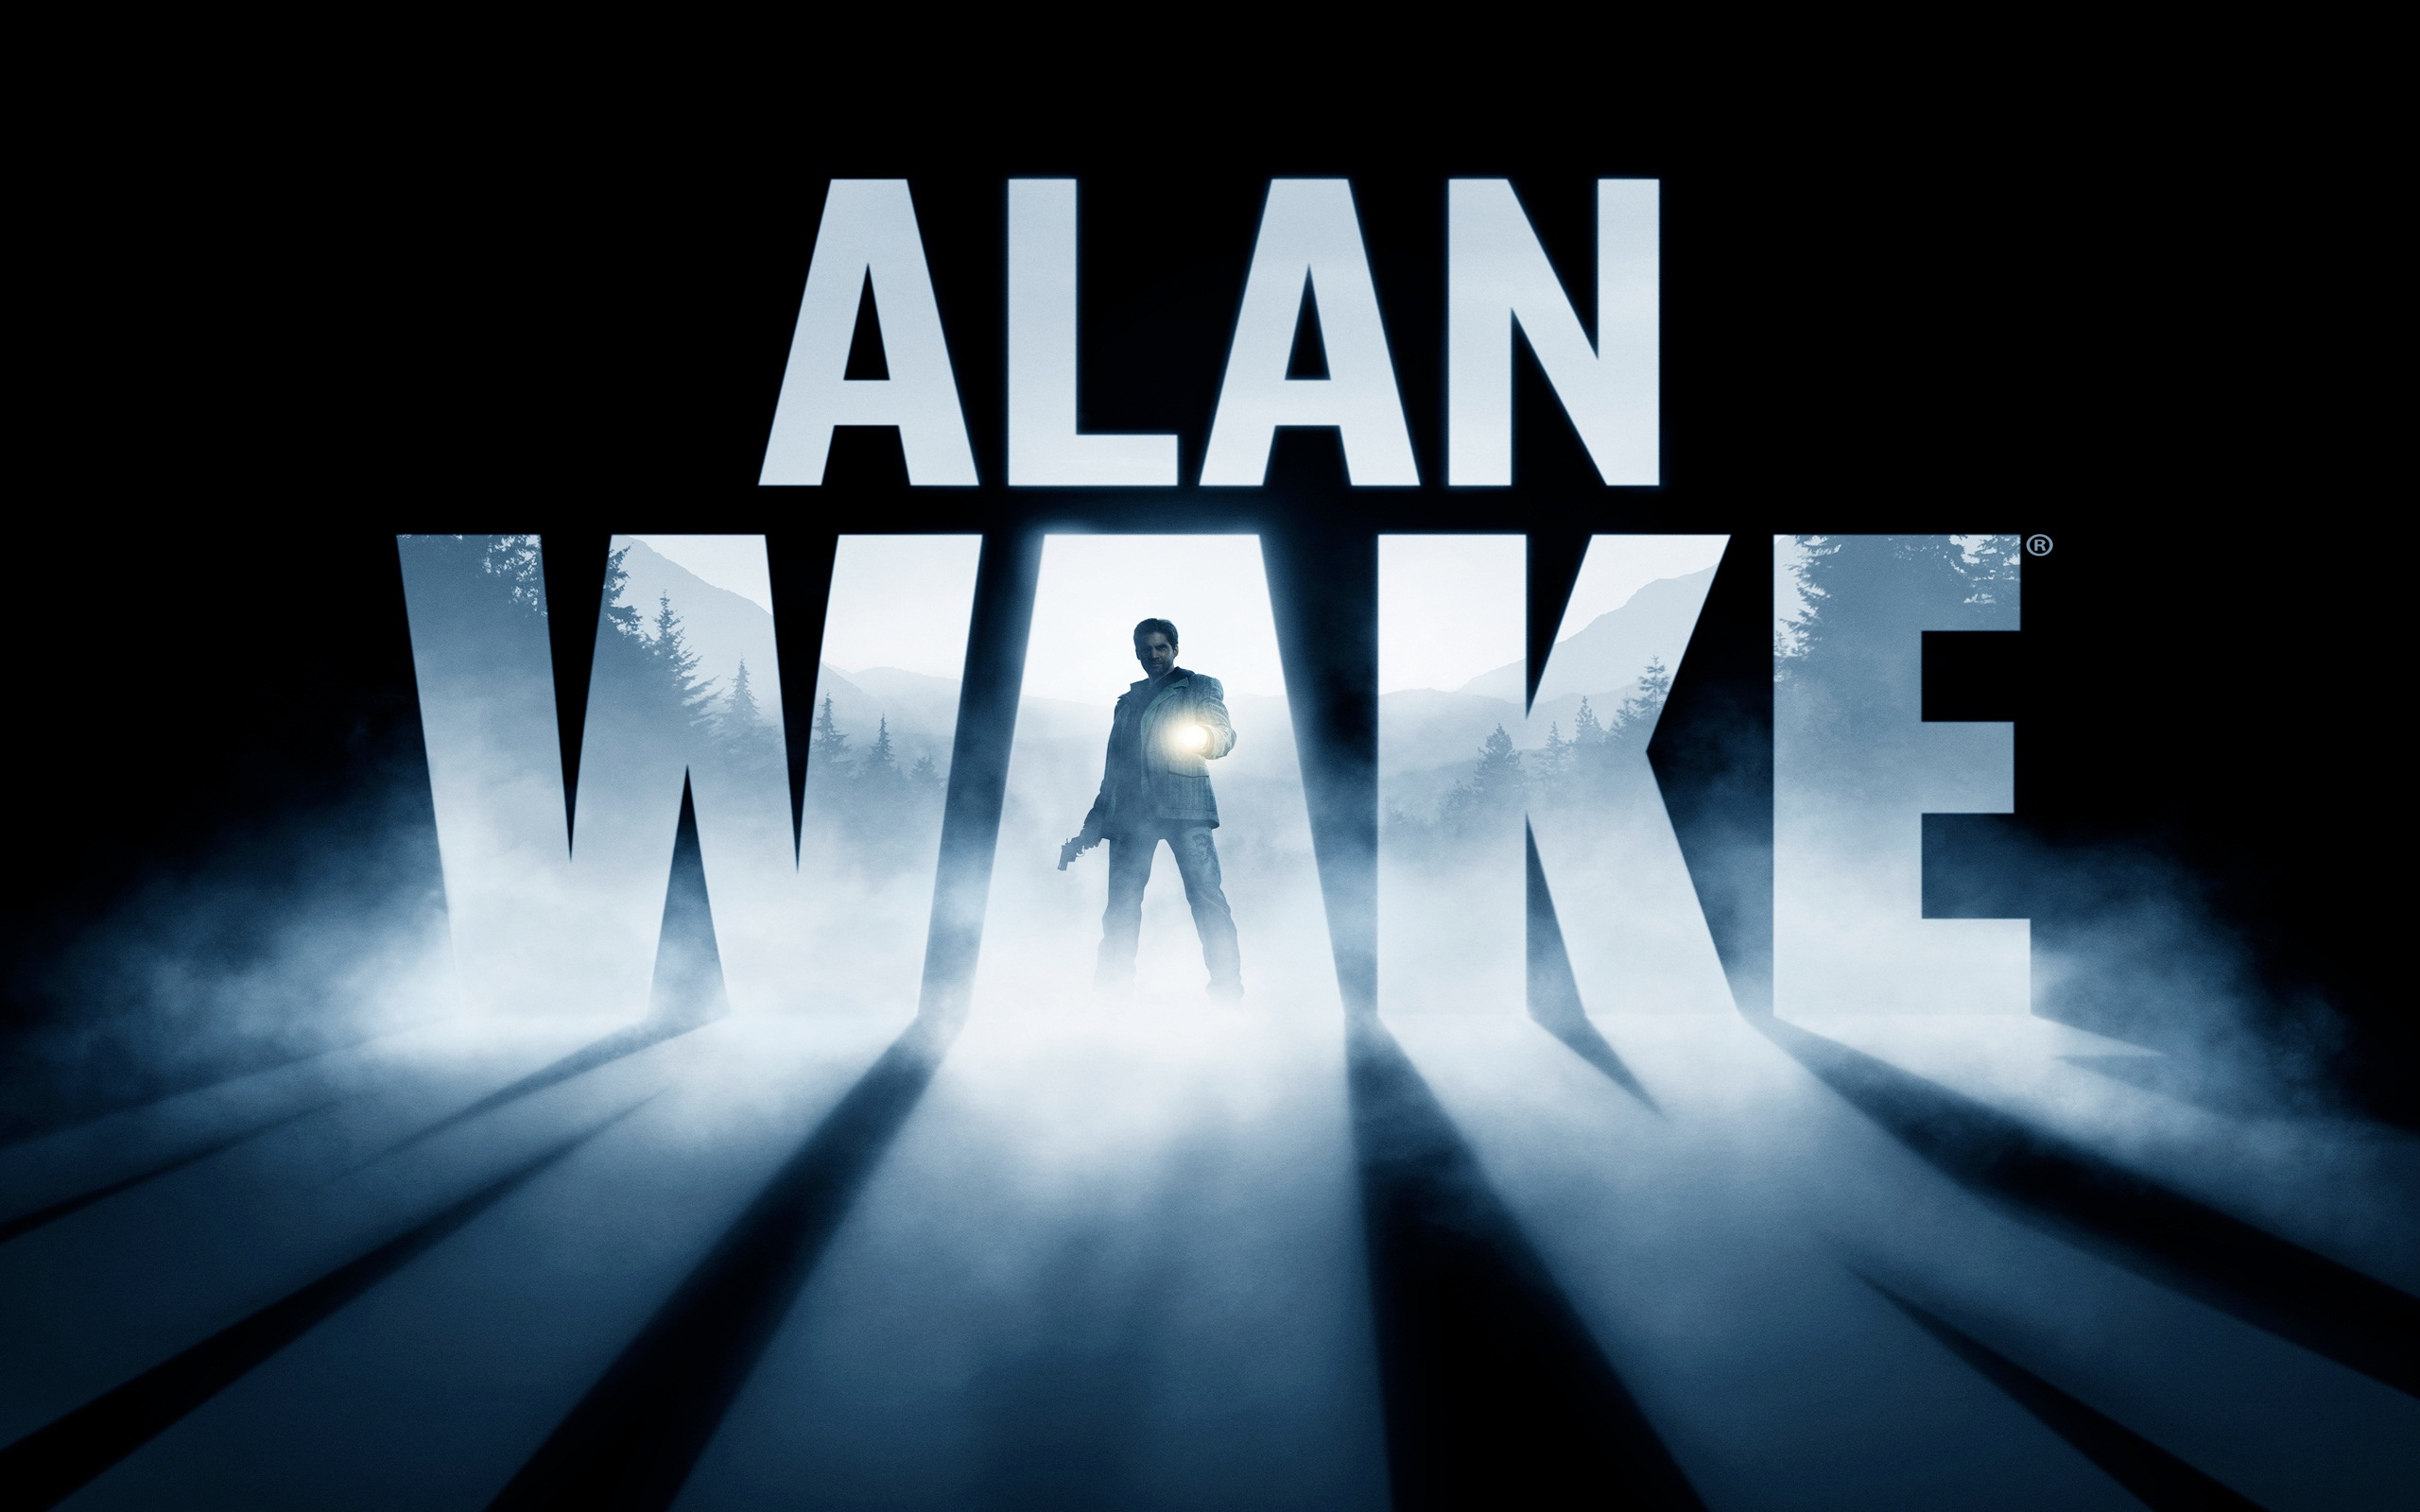 alan_wake_game-wide.jpg